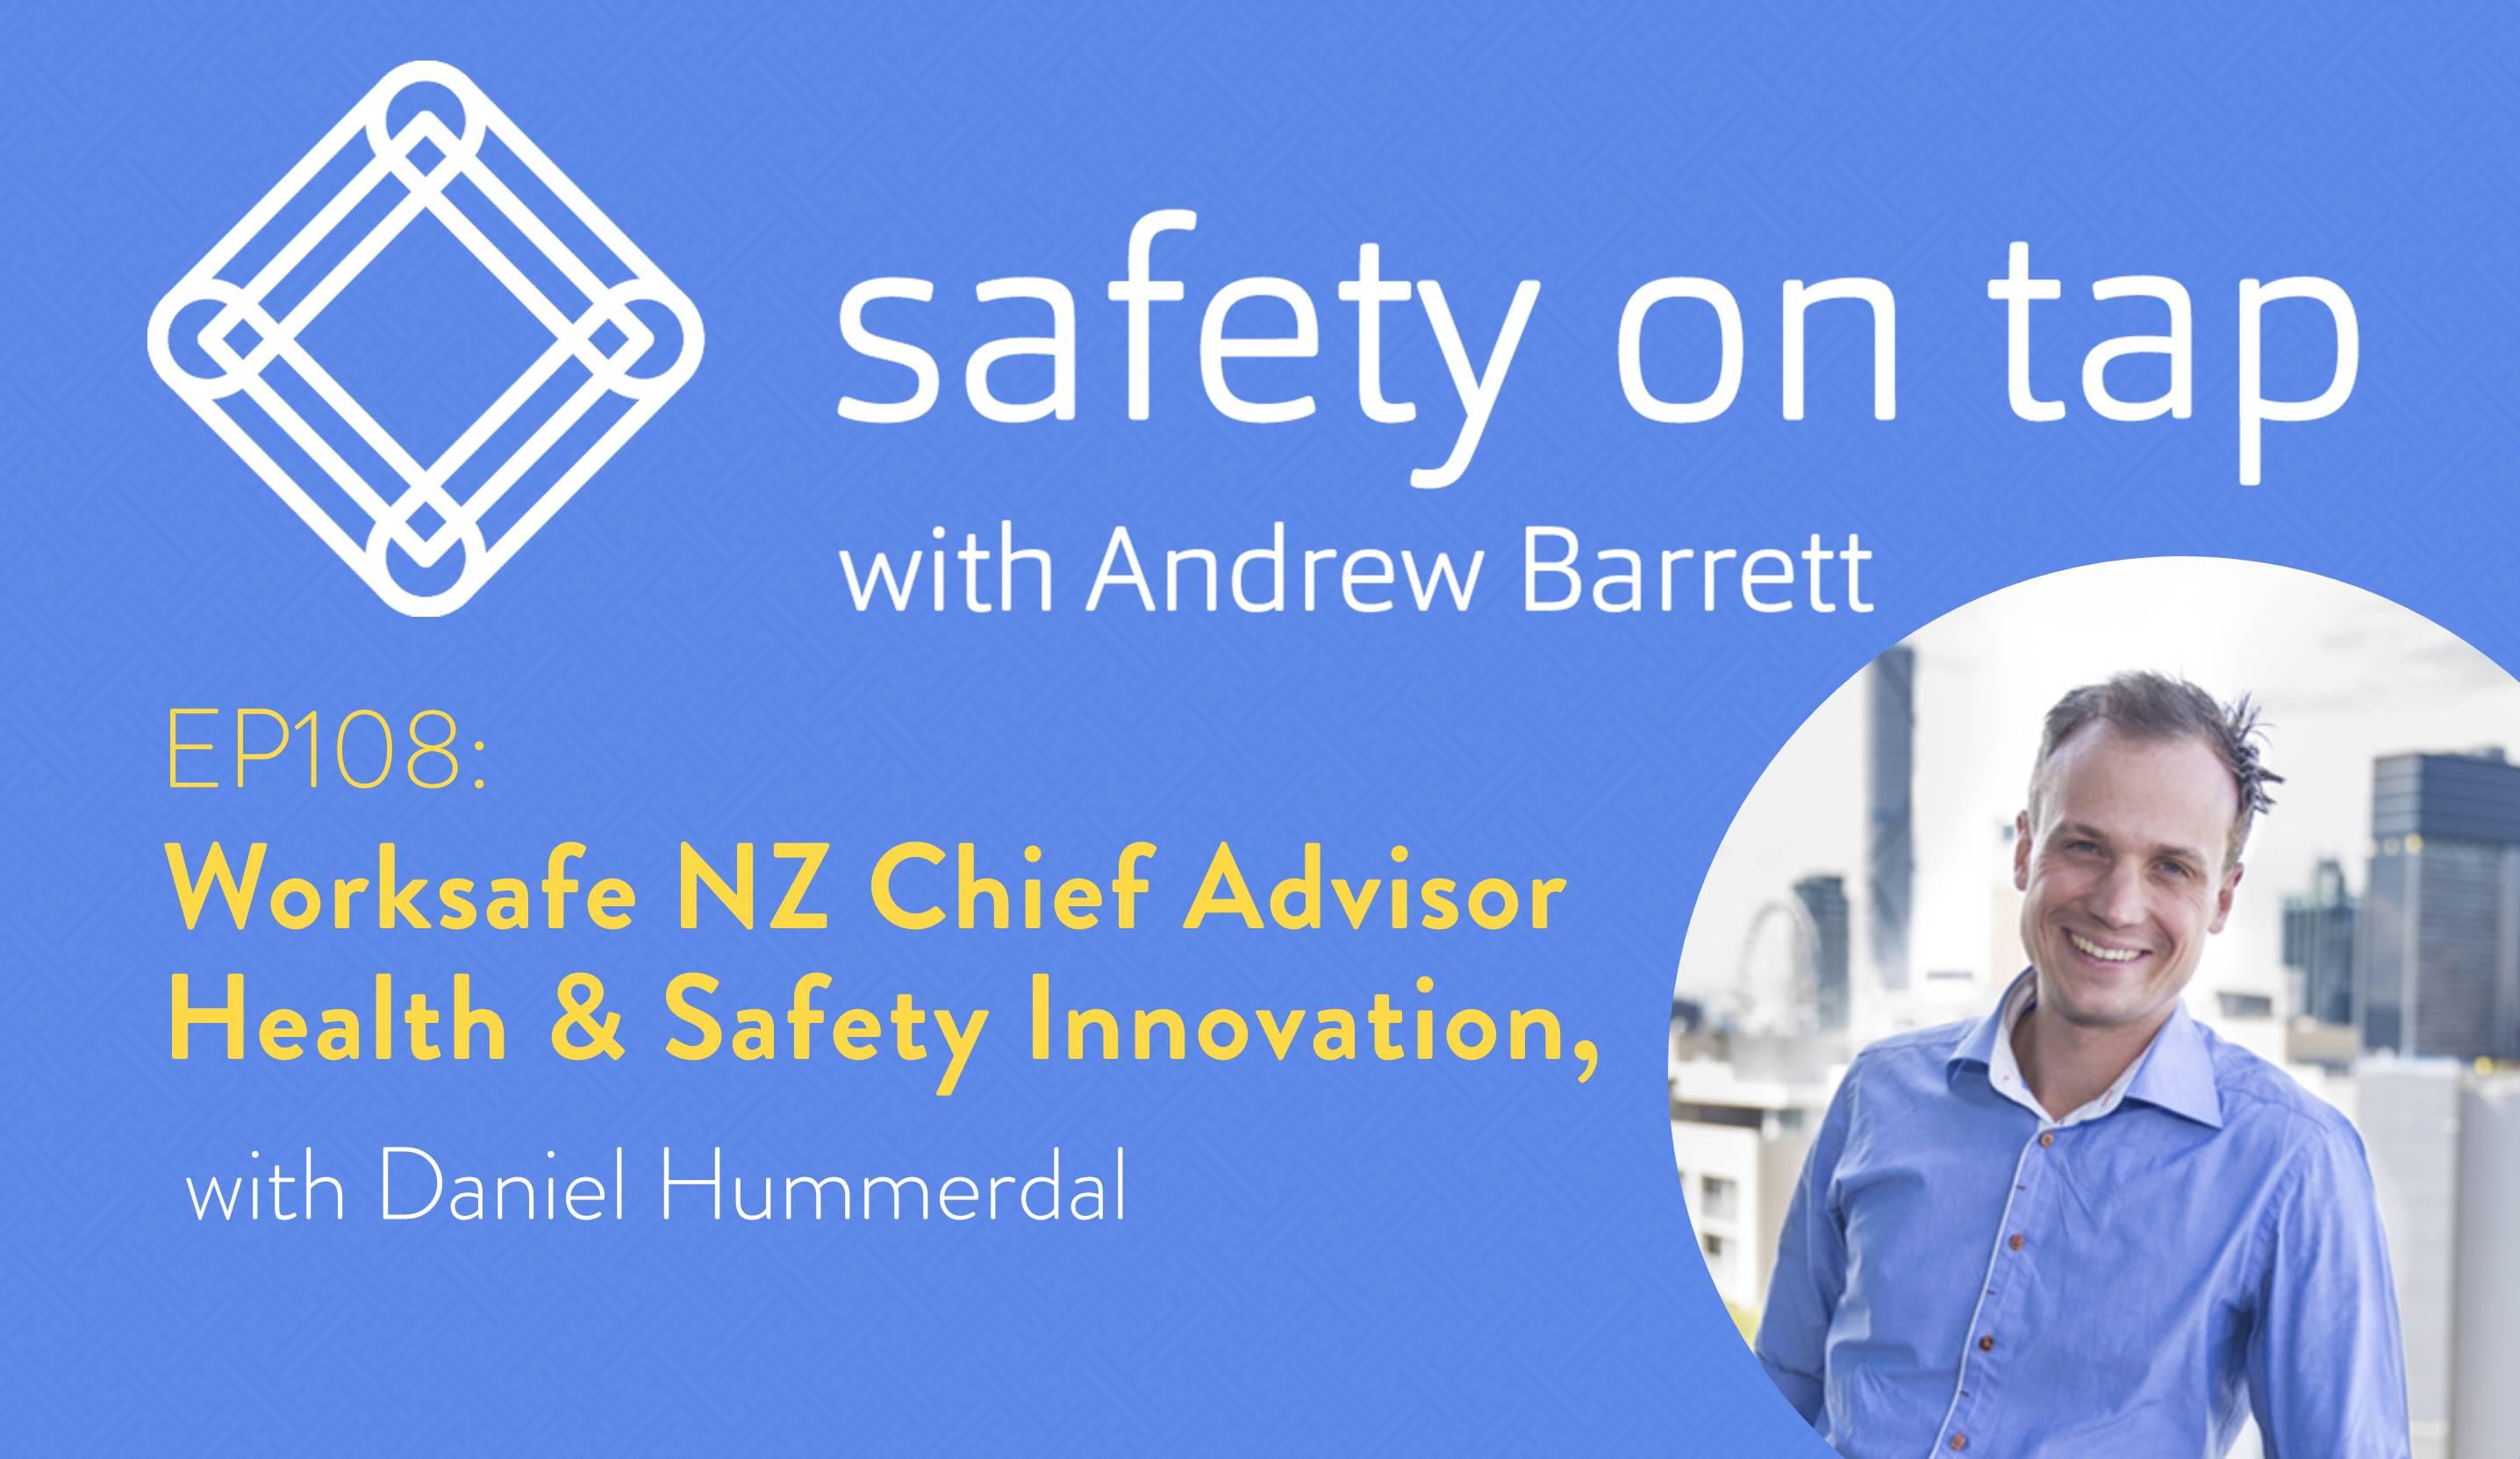 Ep108: Worksafe NZ Chief Advisor Health & Safety Innovation, Daniel Hummerdal